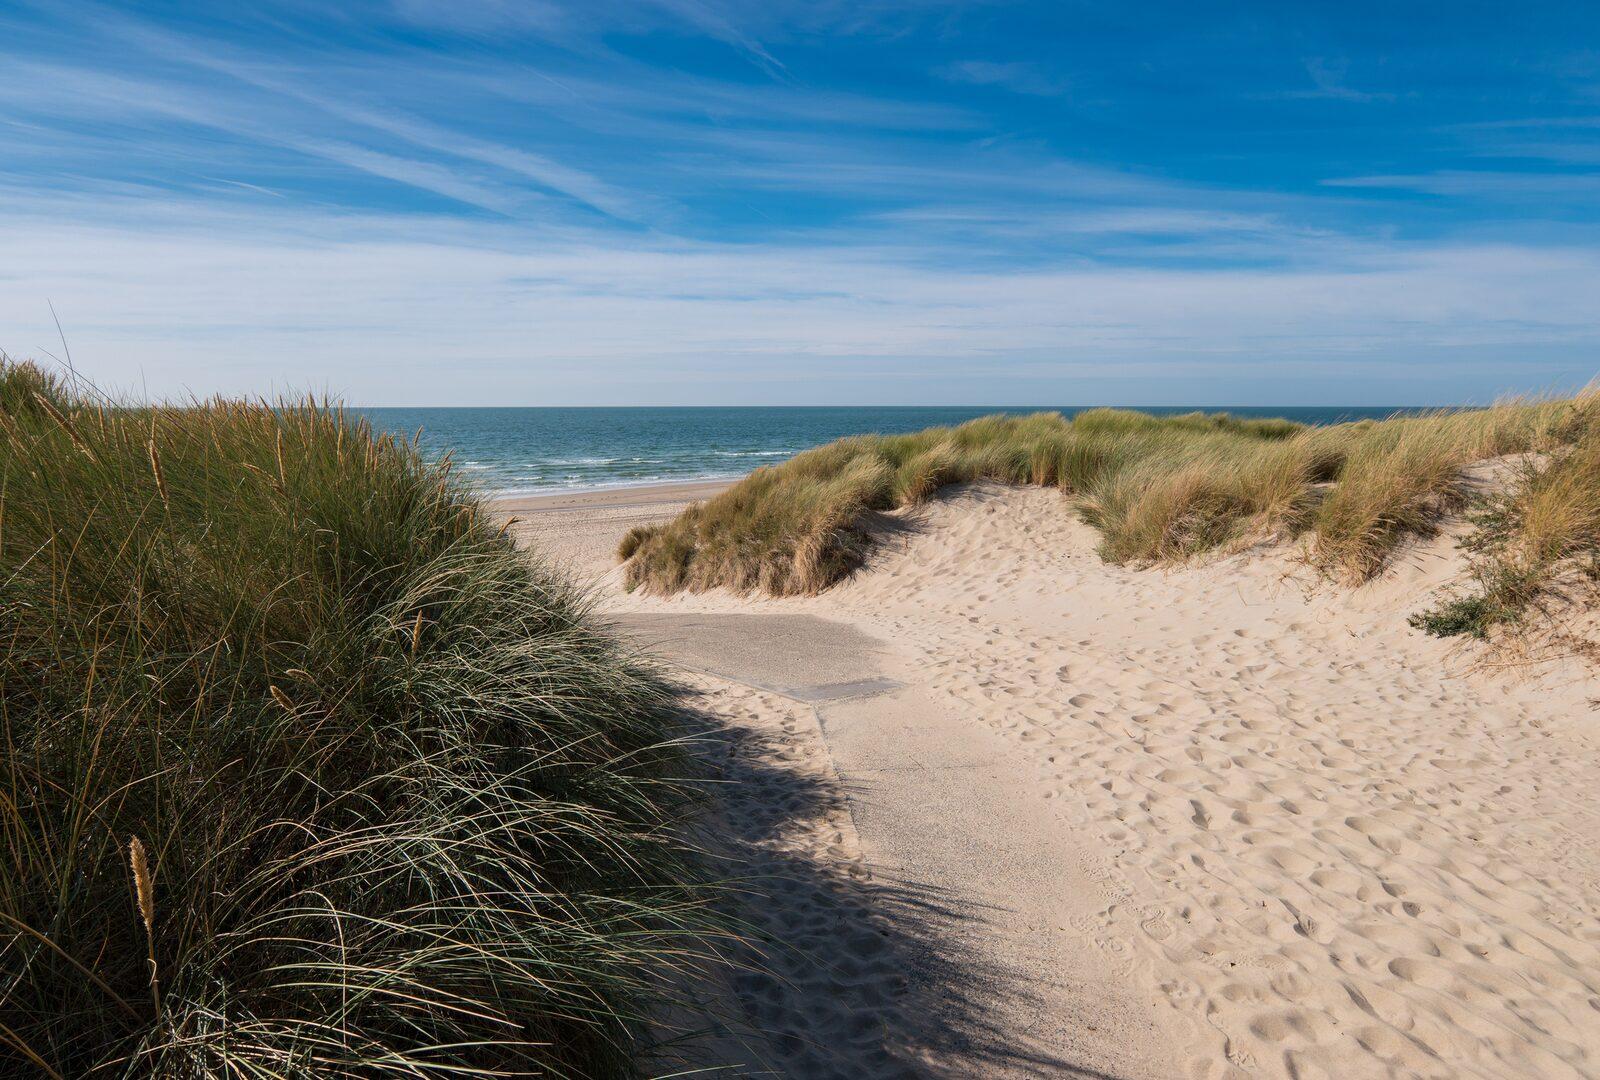 Beach house dune side 4p